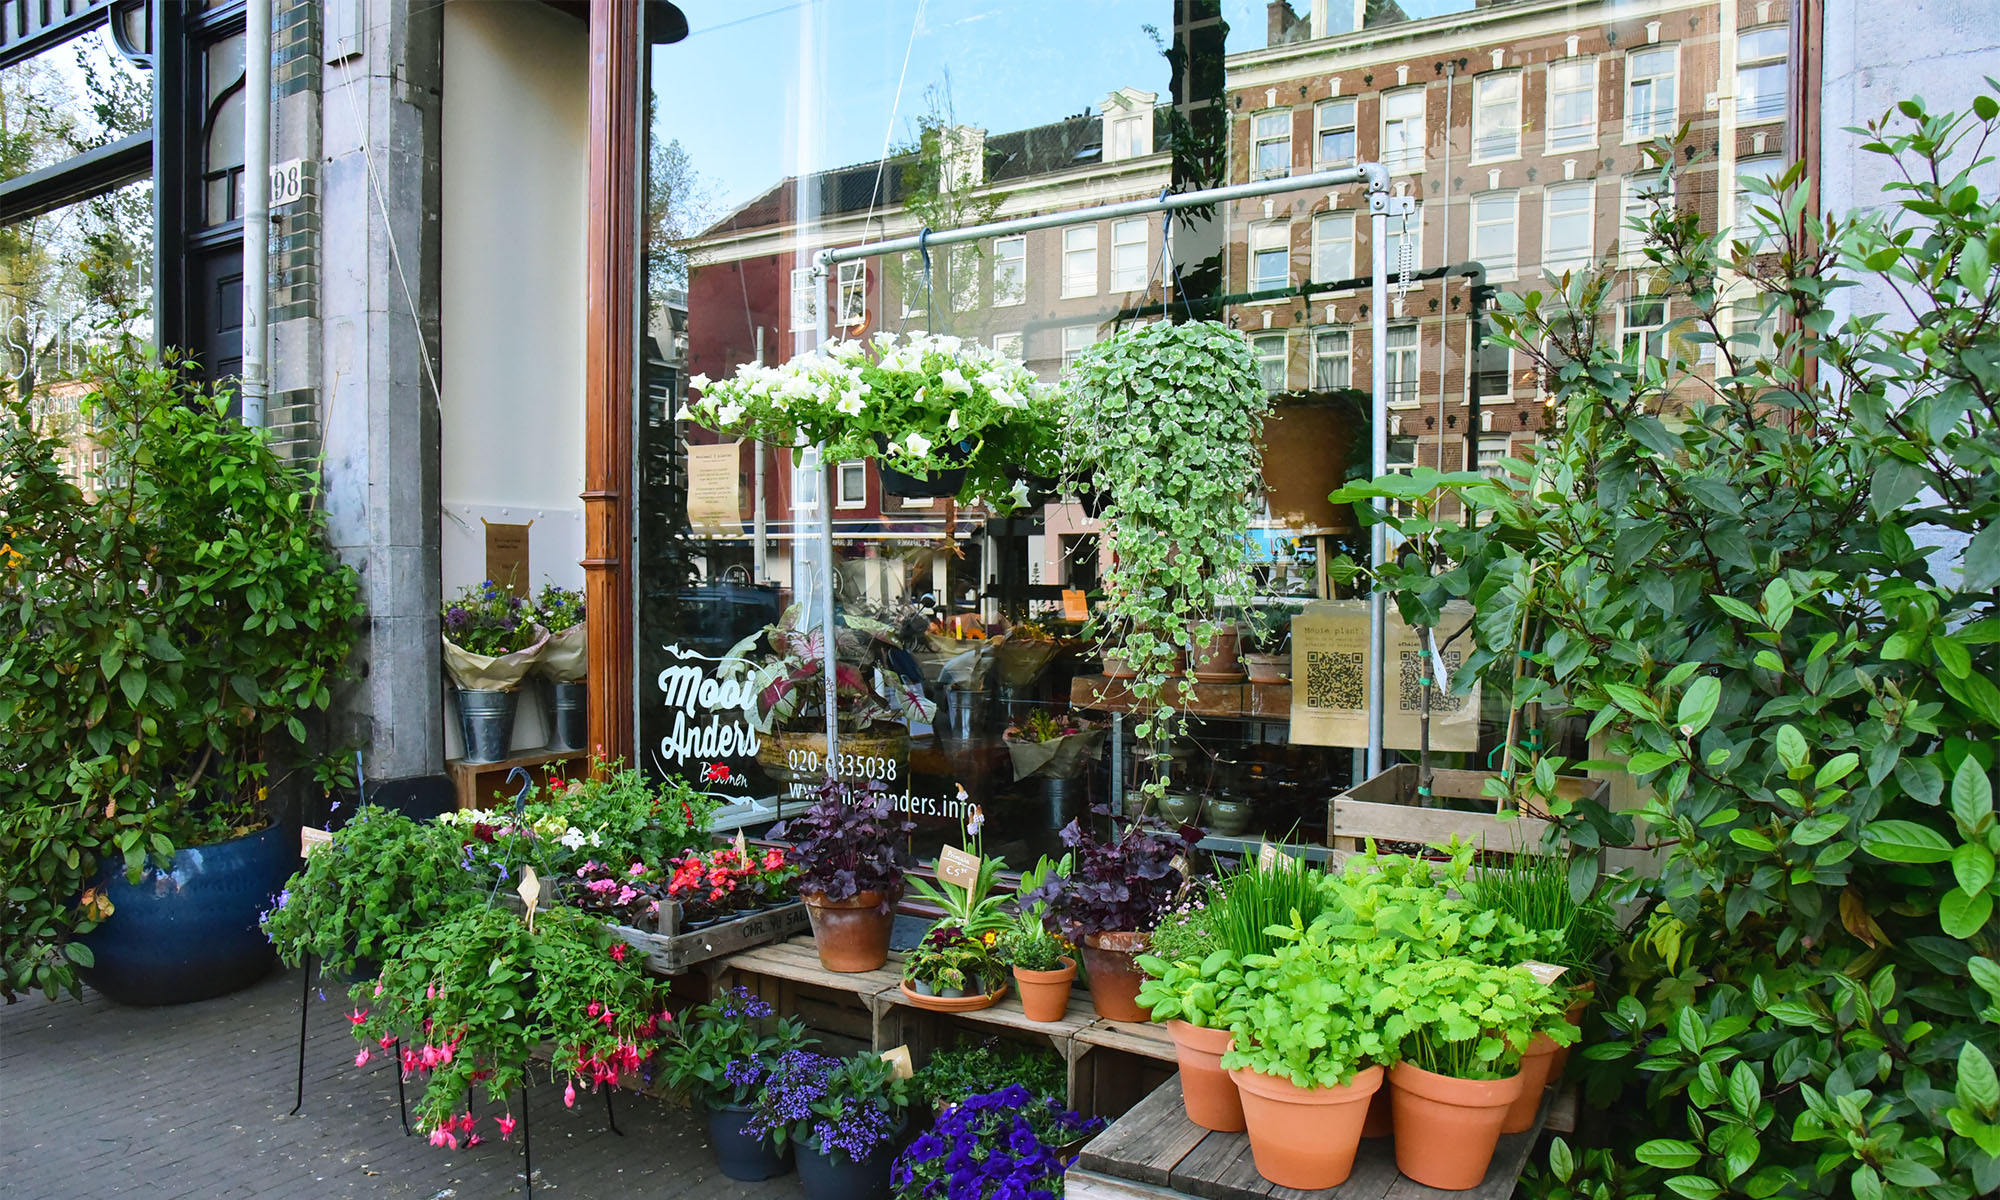 Façade of the flower shop Mooi Anders in Amsterdam